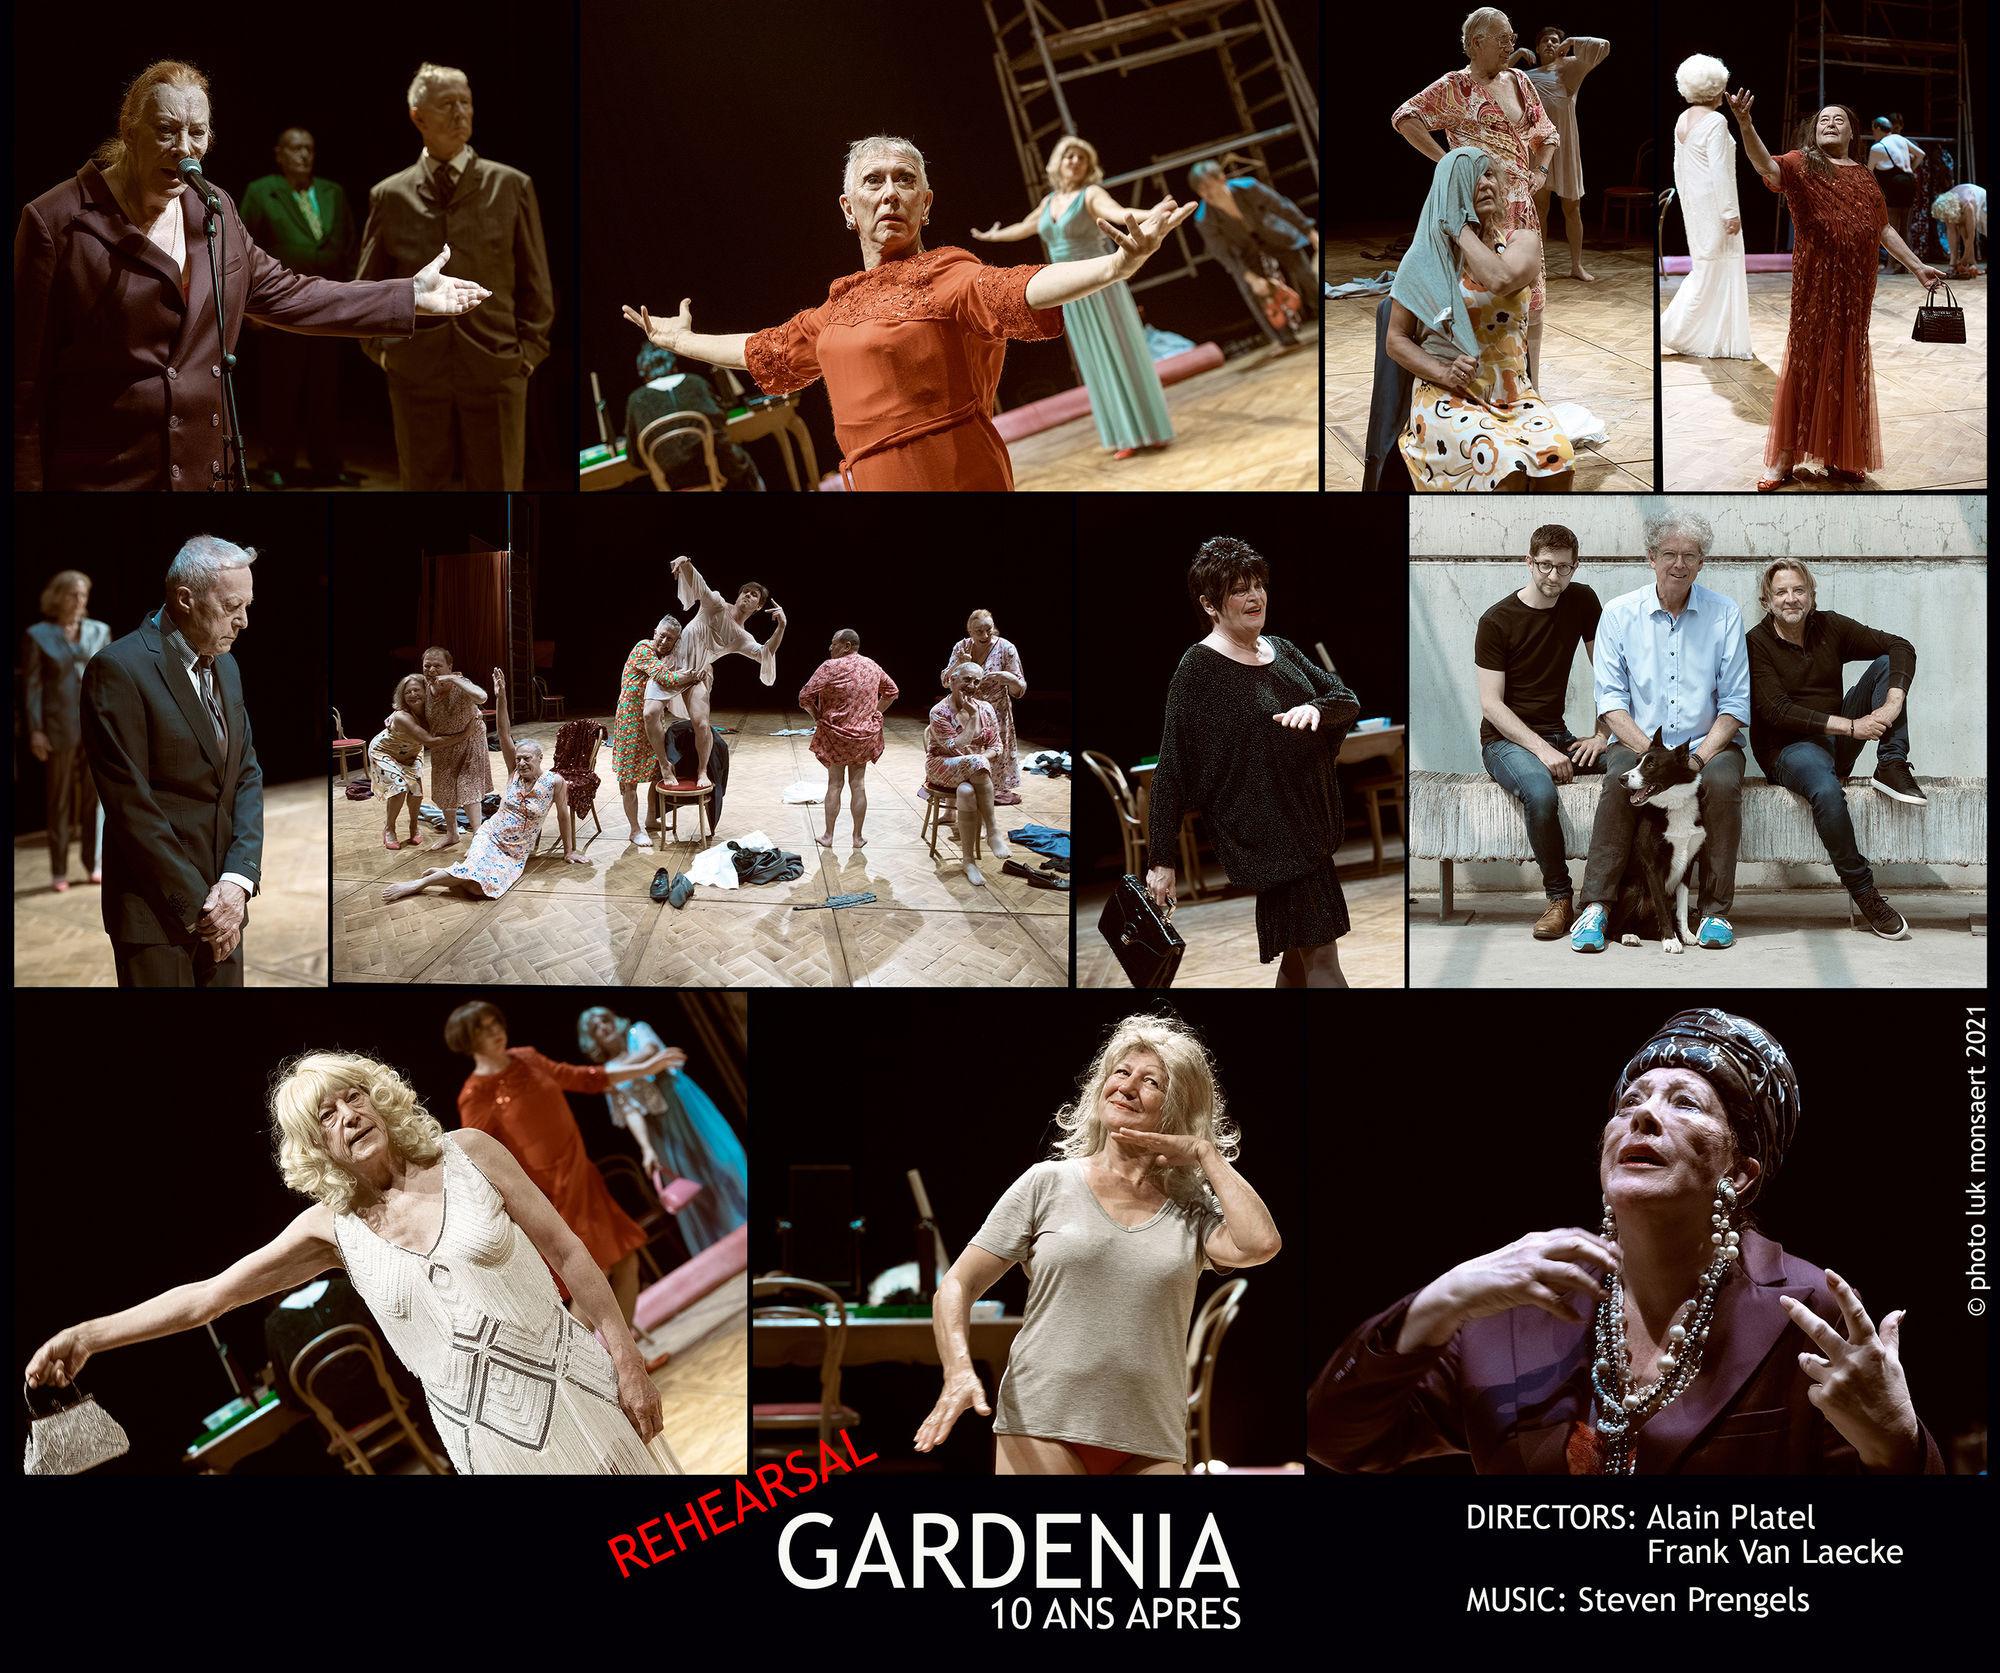 Gardenia - 10 ans après